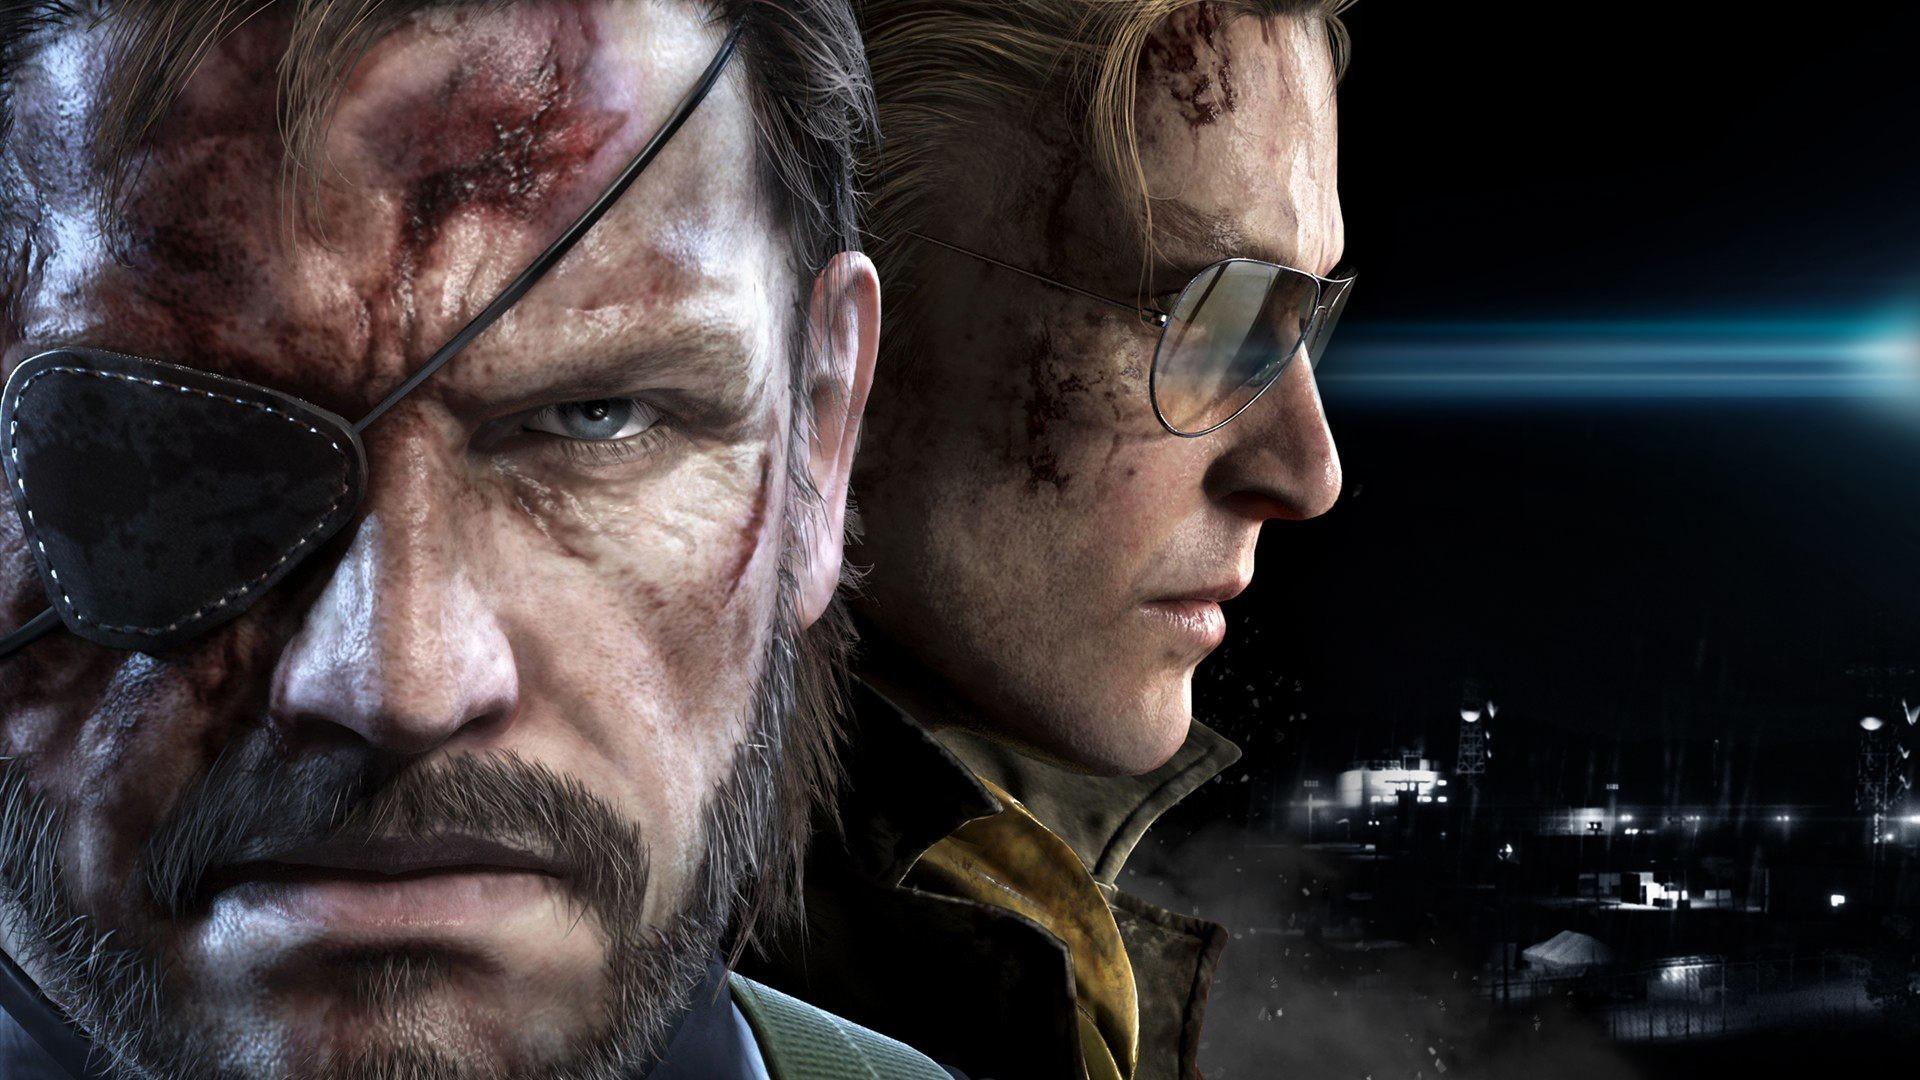 Metal Gear Solid V Game Wallpaper